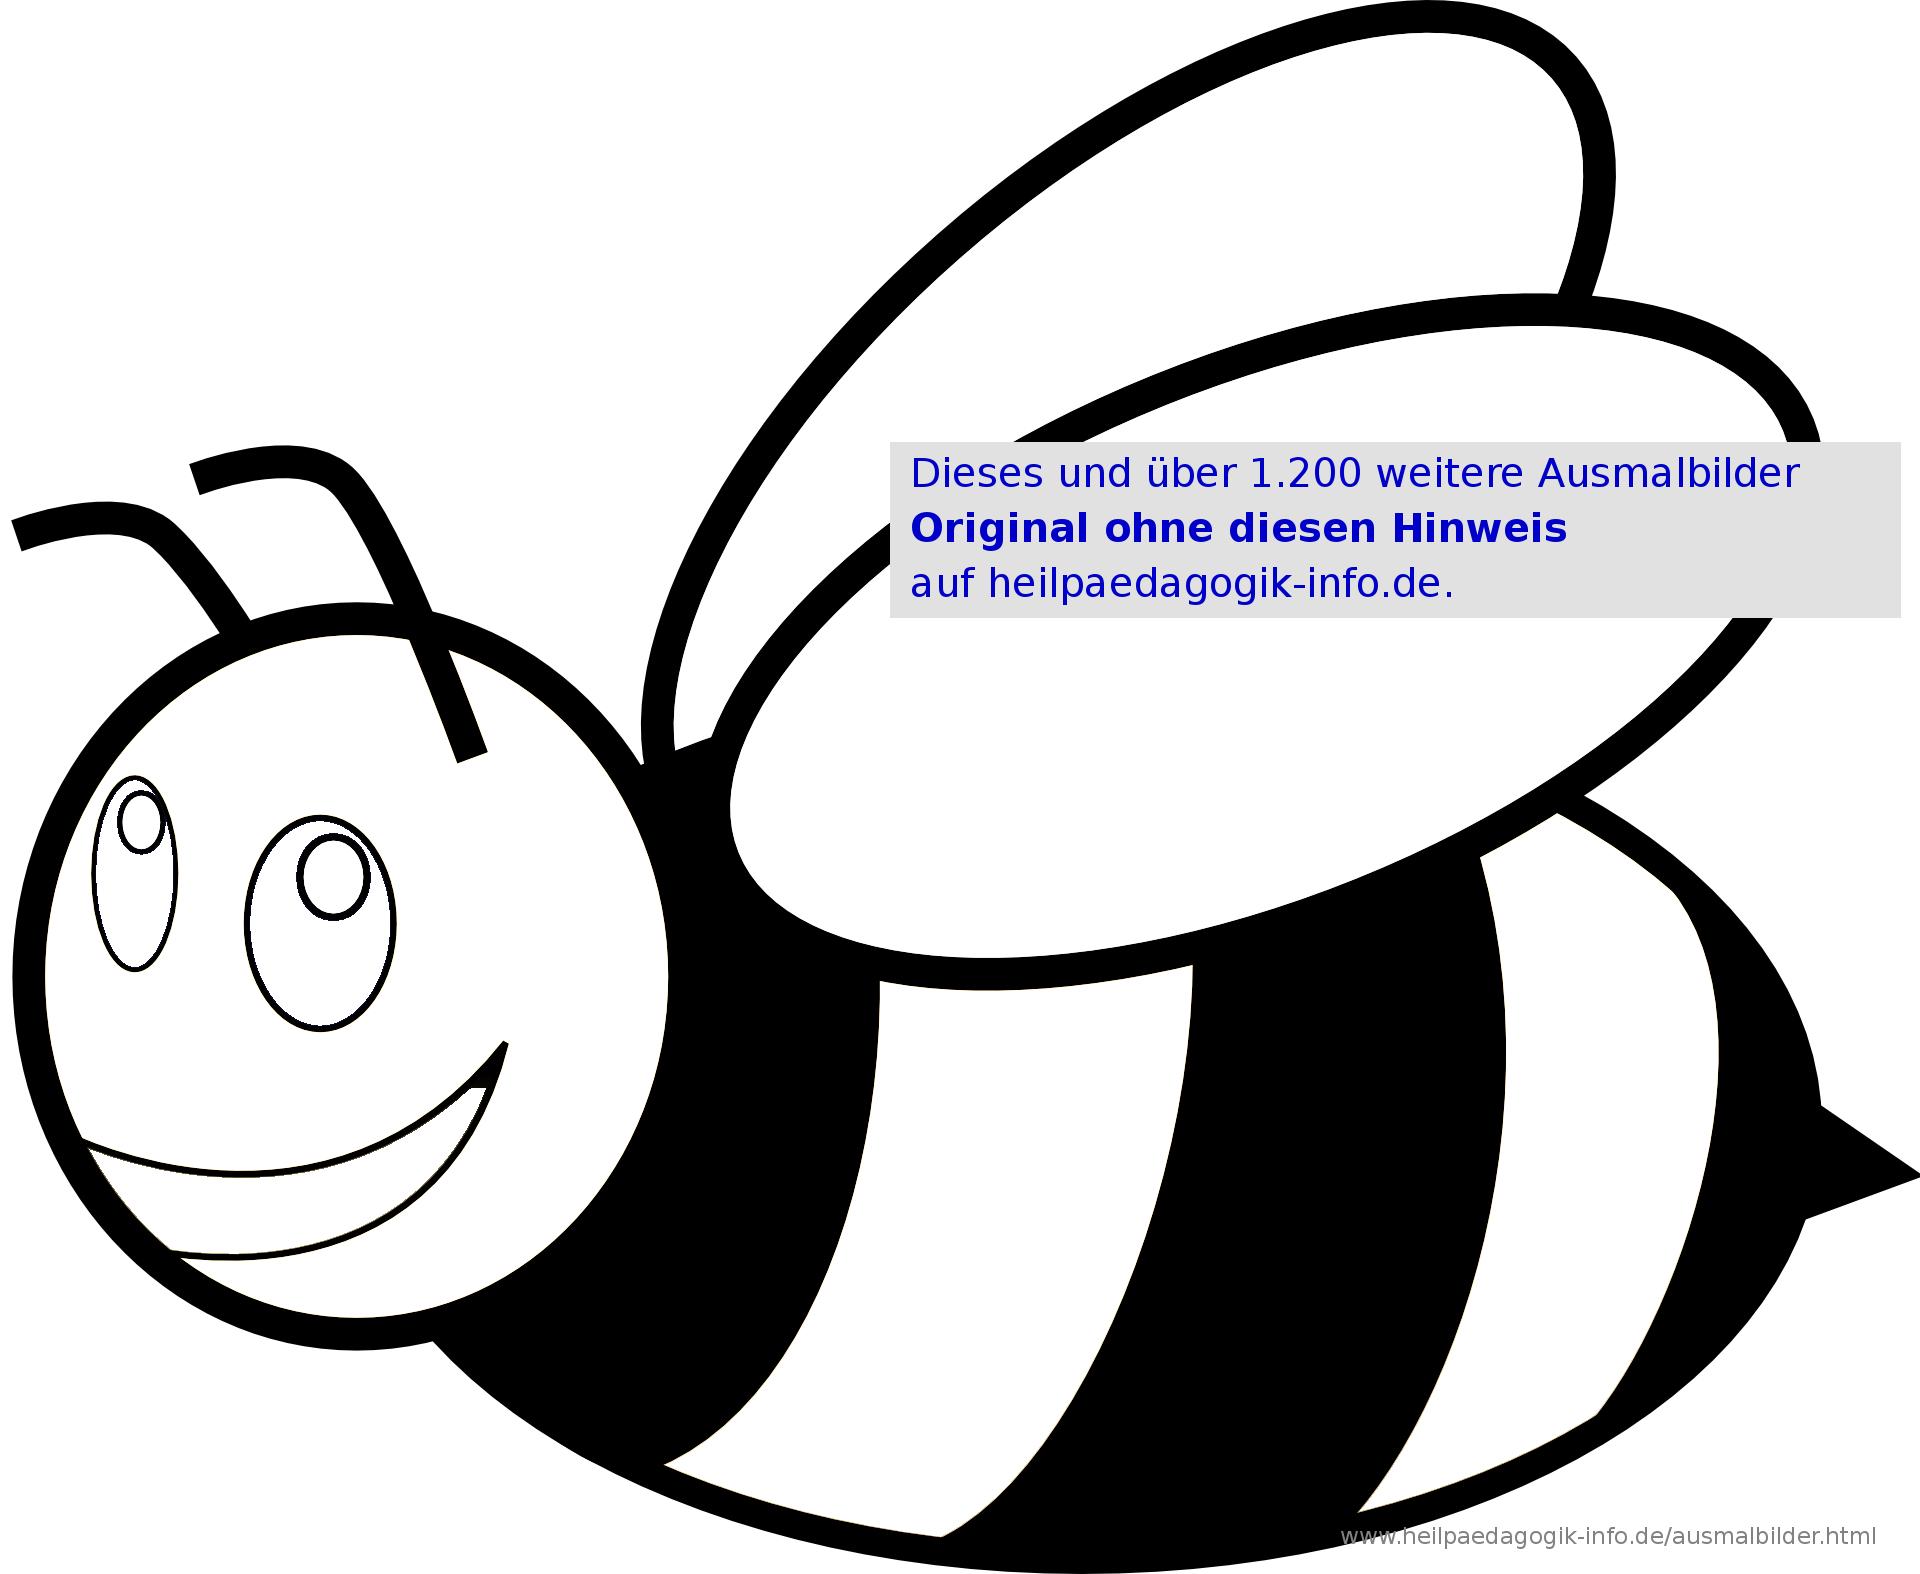 ausmalbilder käfer, schmetterlinge, insekten innen biene